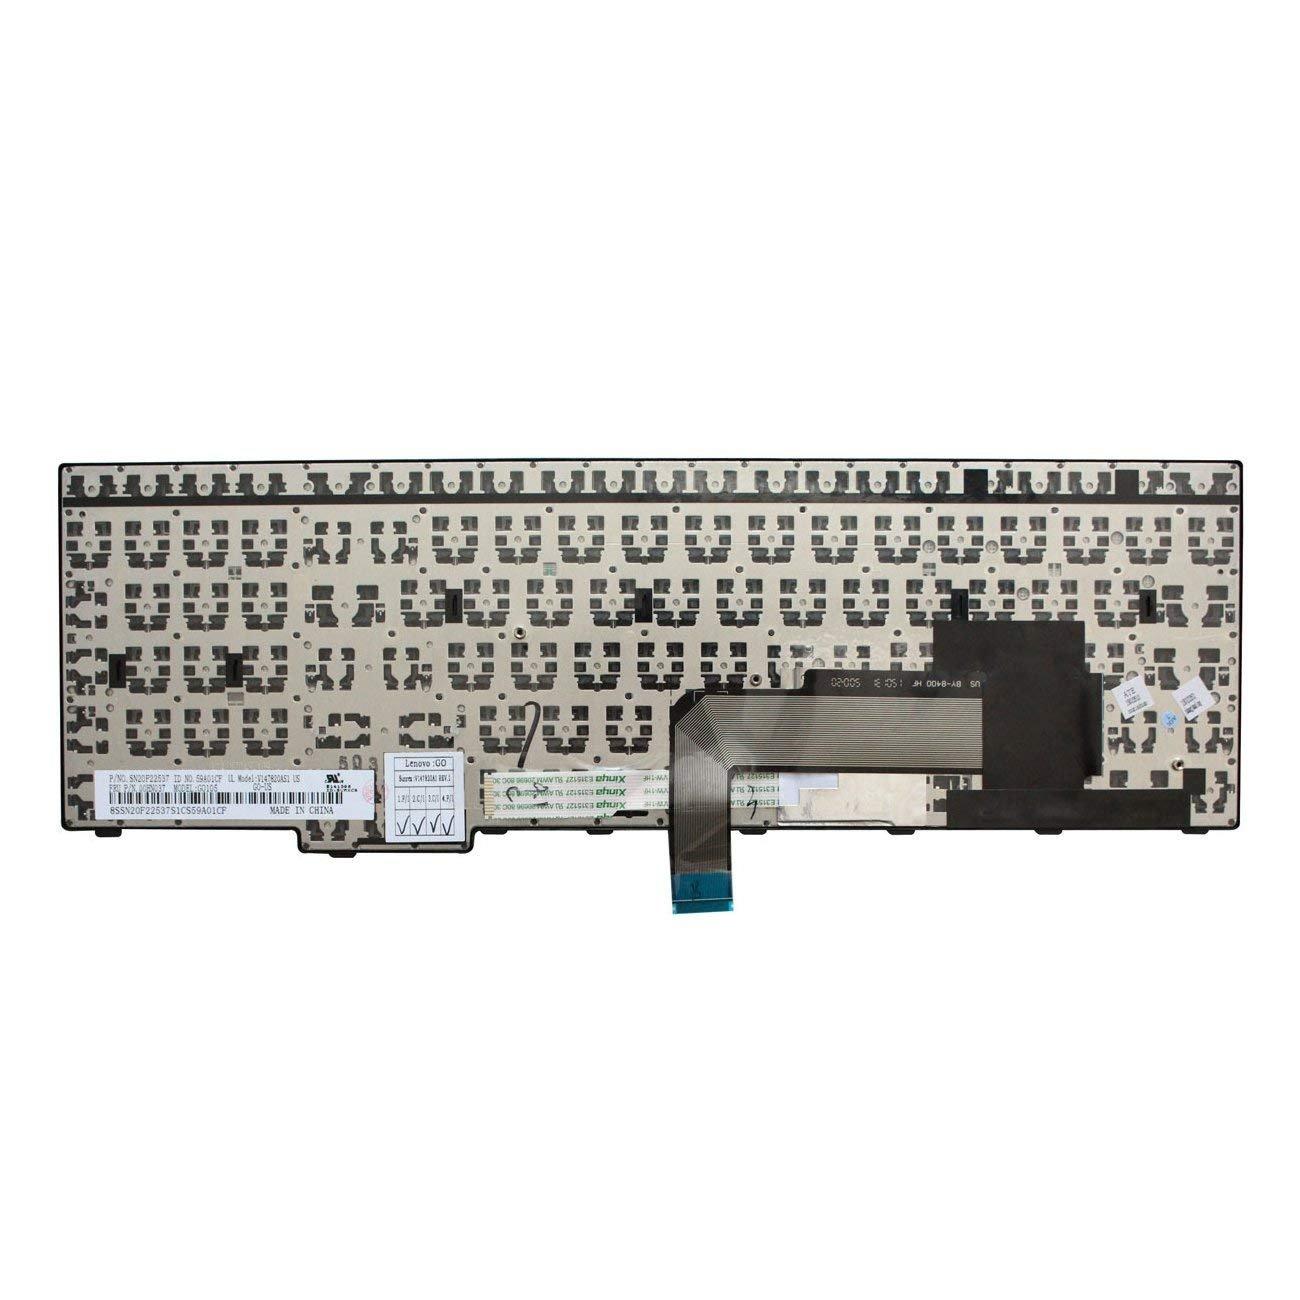 ACOMPATIBLE Replacement Keyboard for Lenovo Thinkpad E550 E550C E555 E560  E565 Laptop